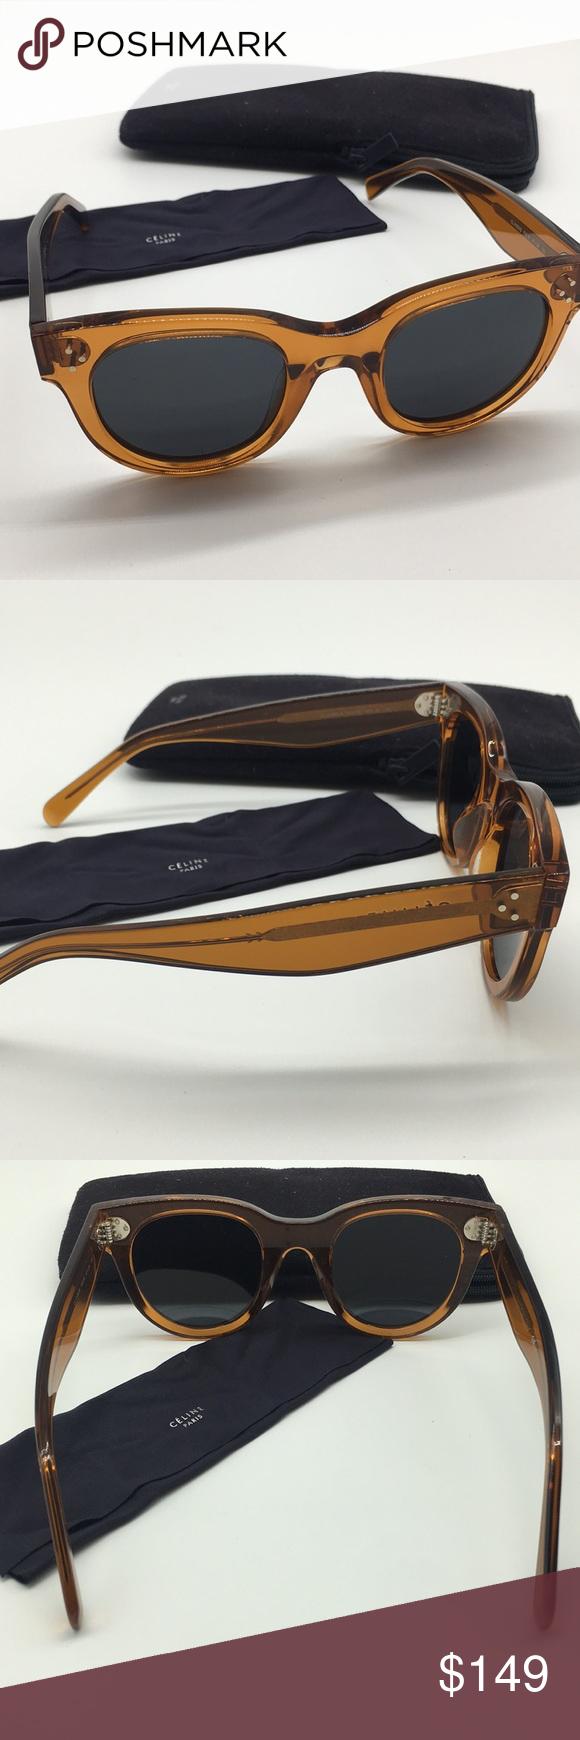 dec23ab584c19 NEW Celine Baby Audrey Orange Crystal Sunglasses These are SO ...